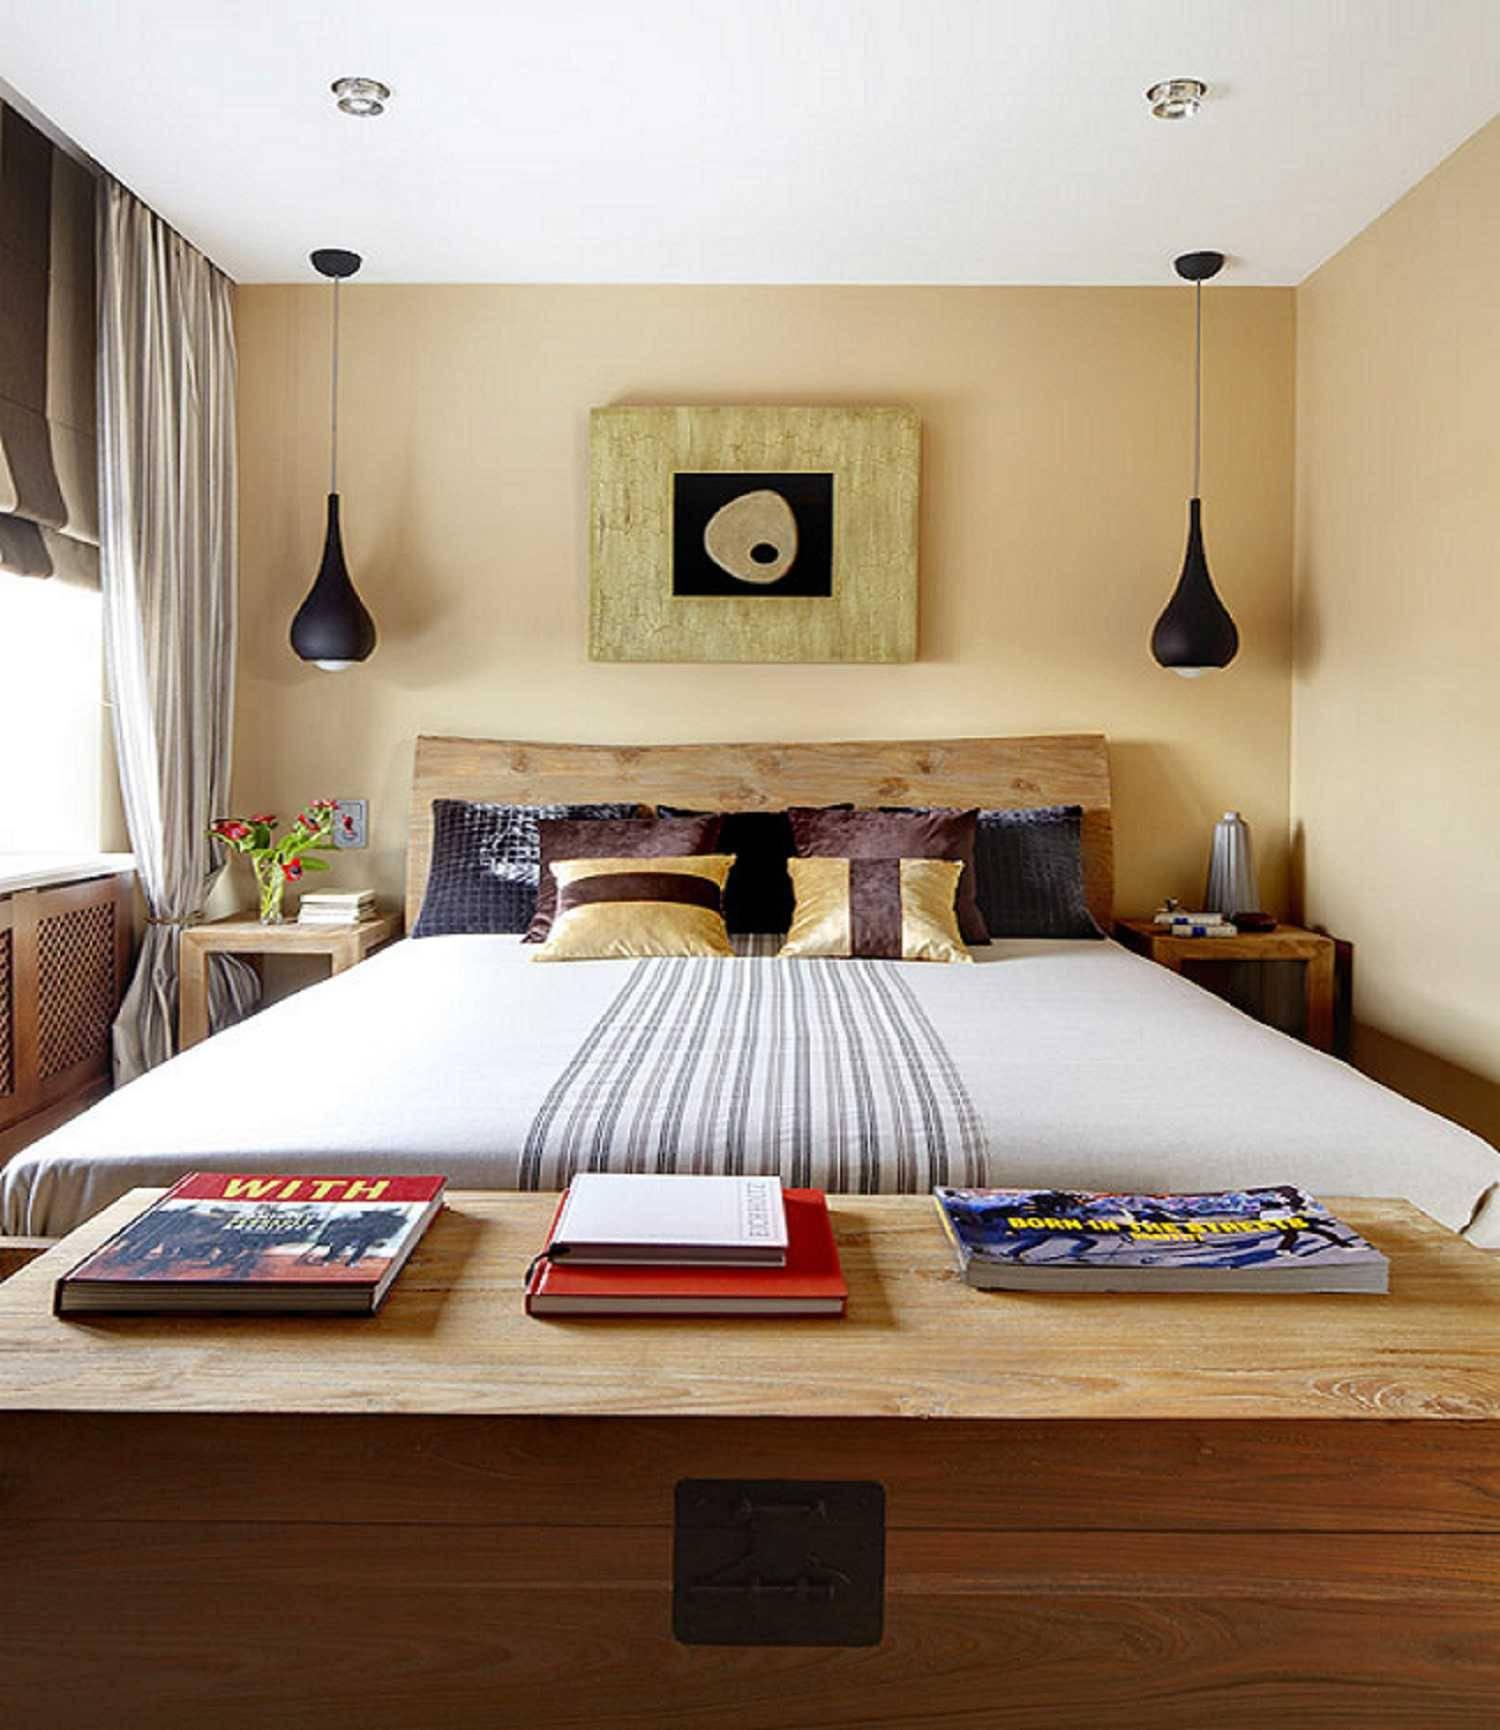 small bedroom 14 586d8bee5f9b584db3364a4c